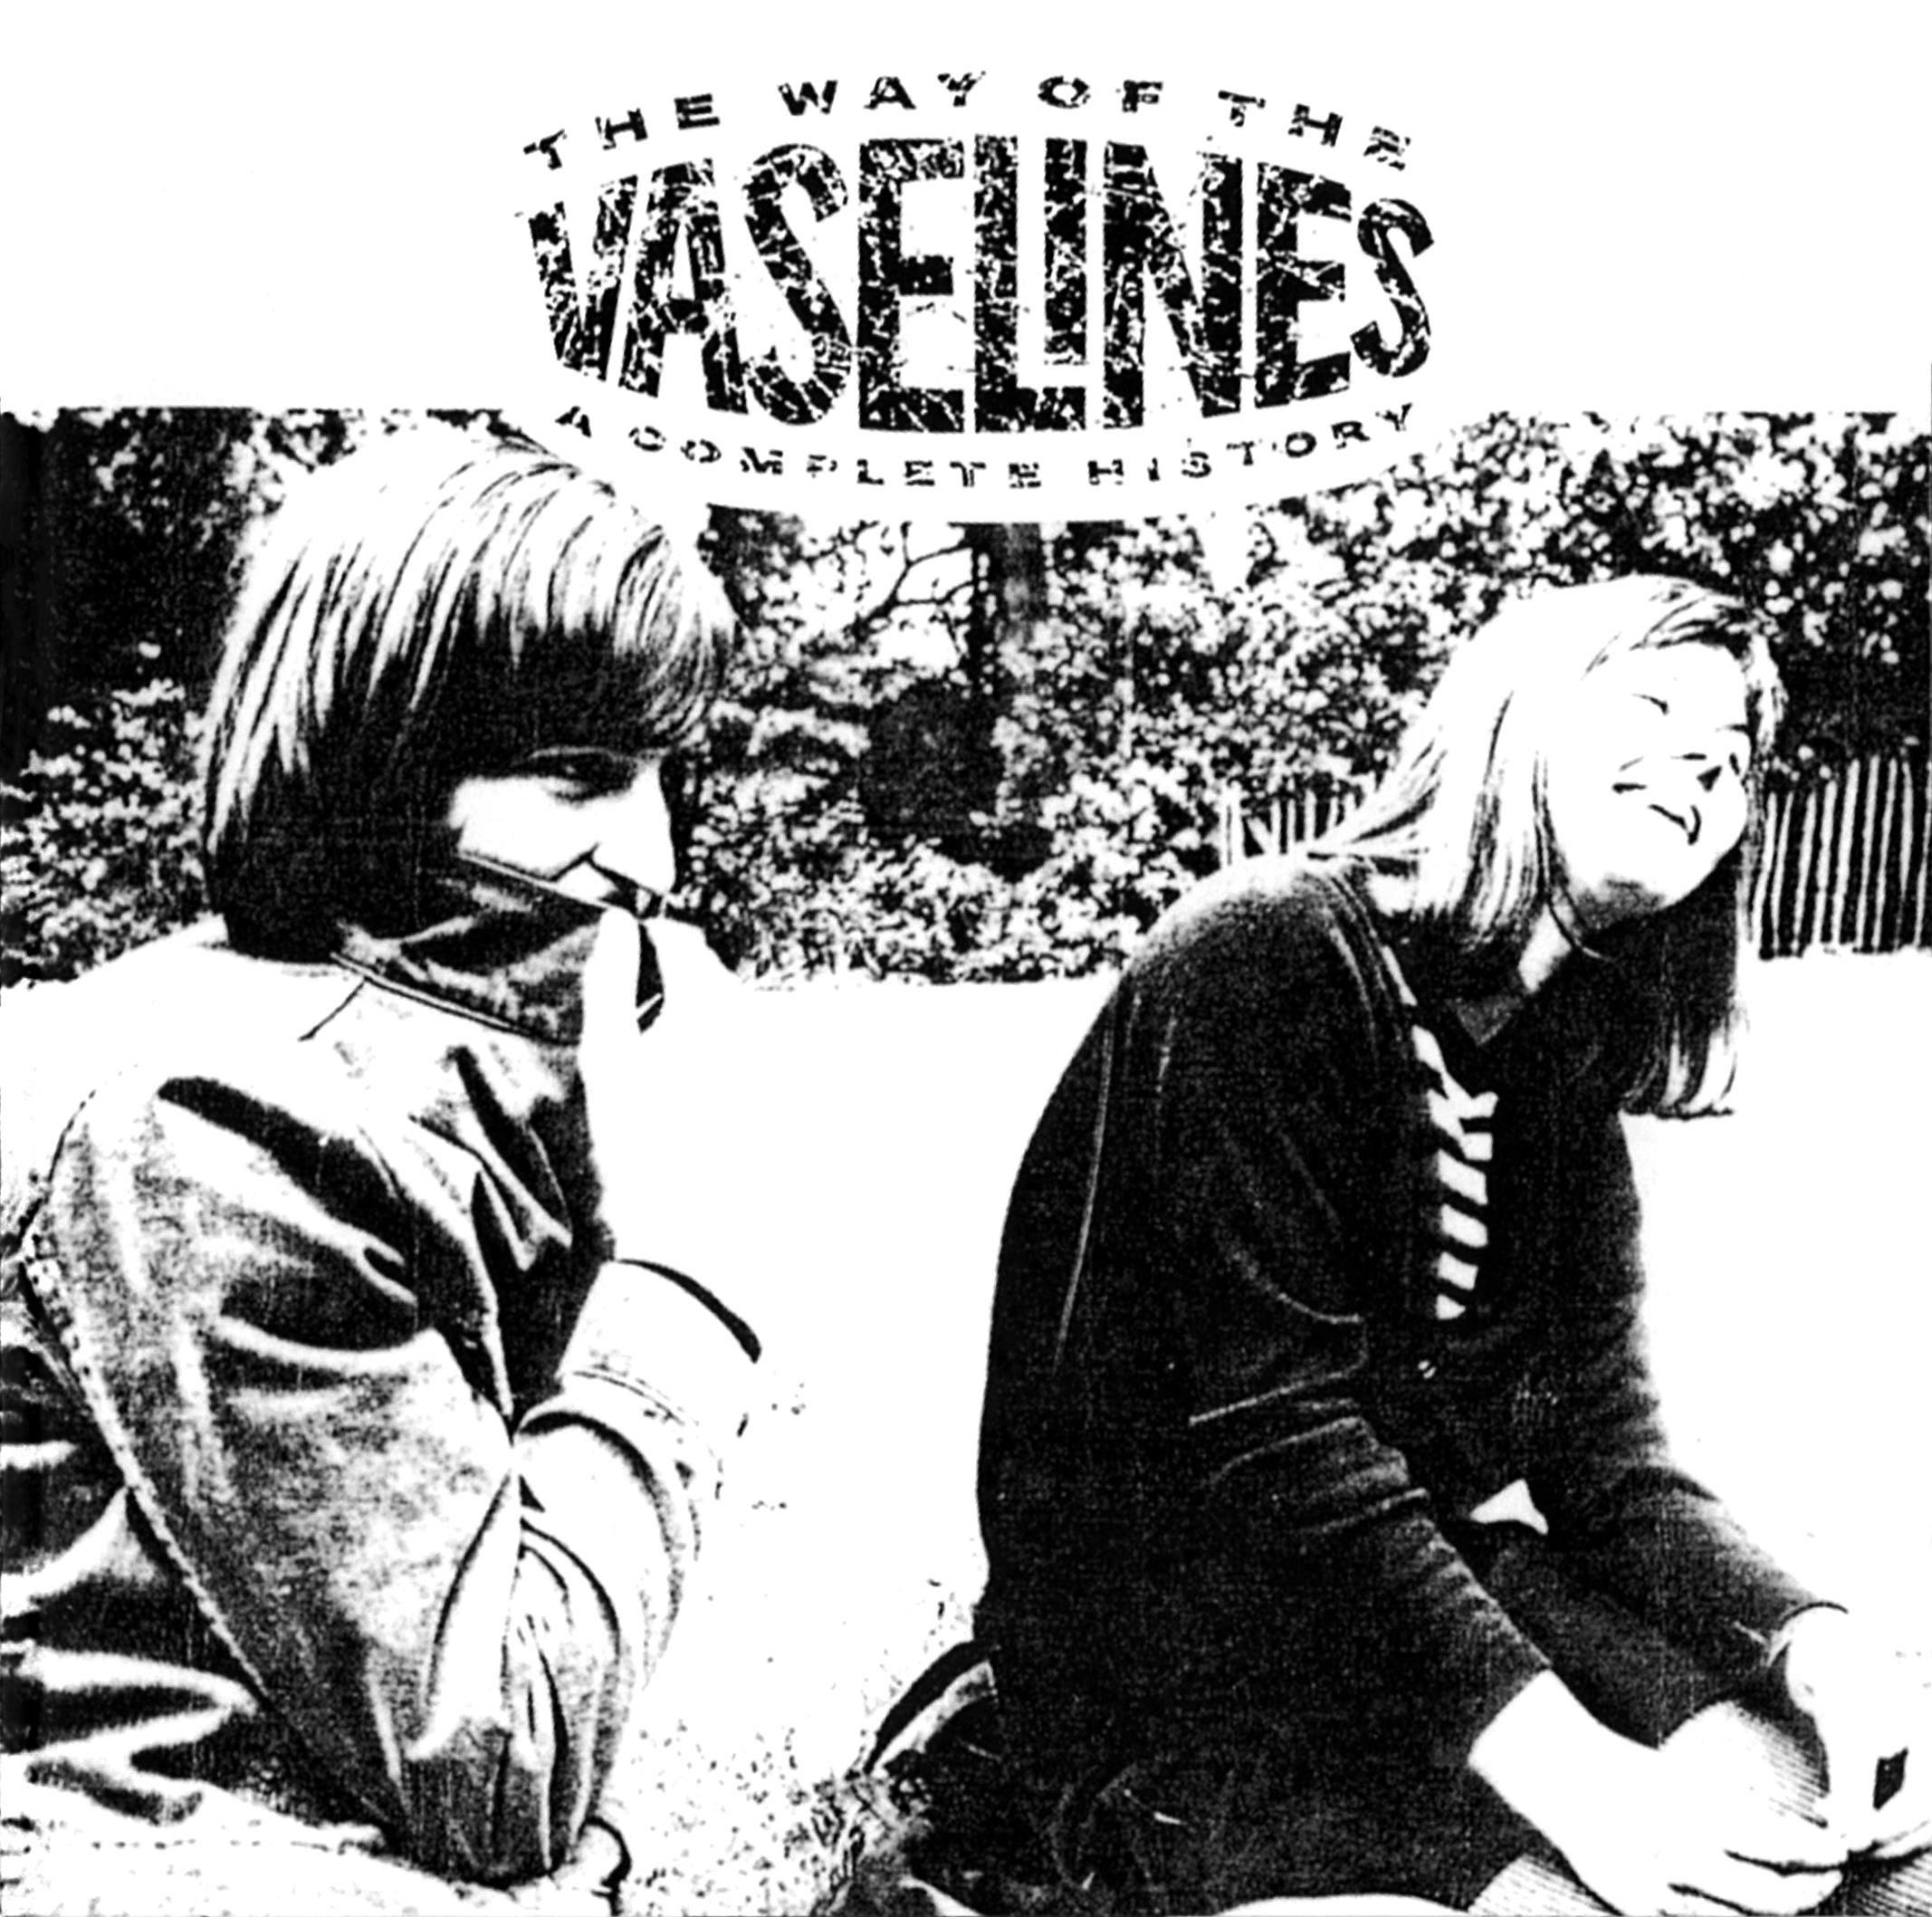 VASELINES (ヴァセリンズ) ベストアルバム『THE WAY OF THE VASELINES A COMPLETE HISTORY』(1998年12月23日発売) 高画質CDジャケット画像 (ジャケ写)